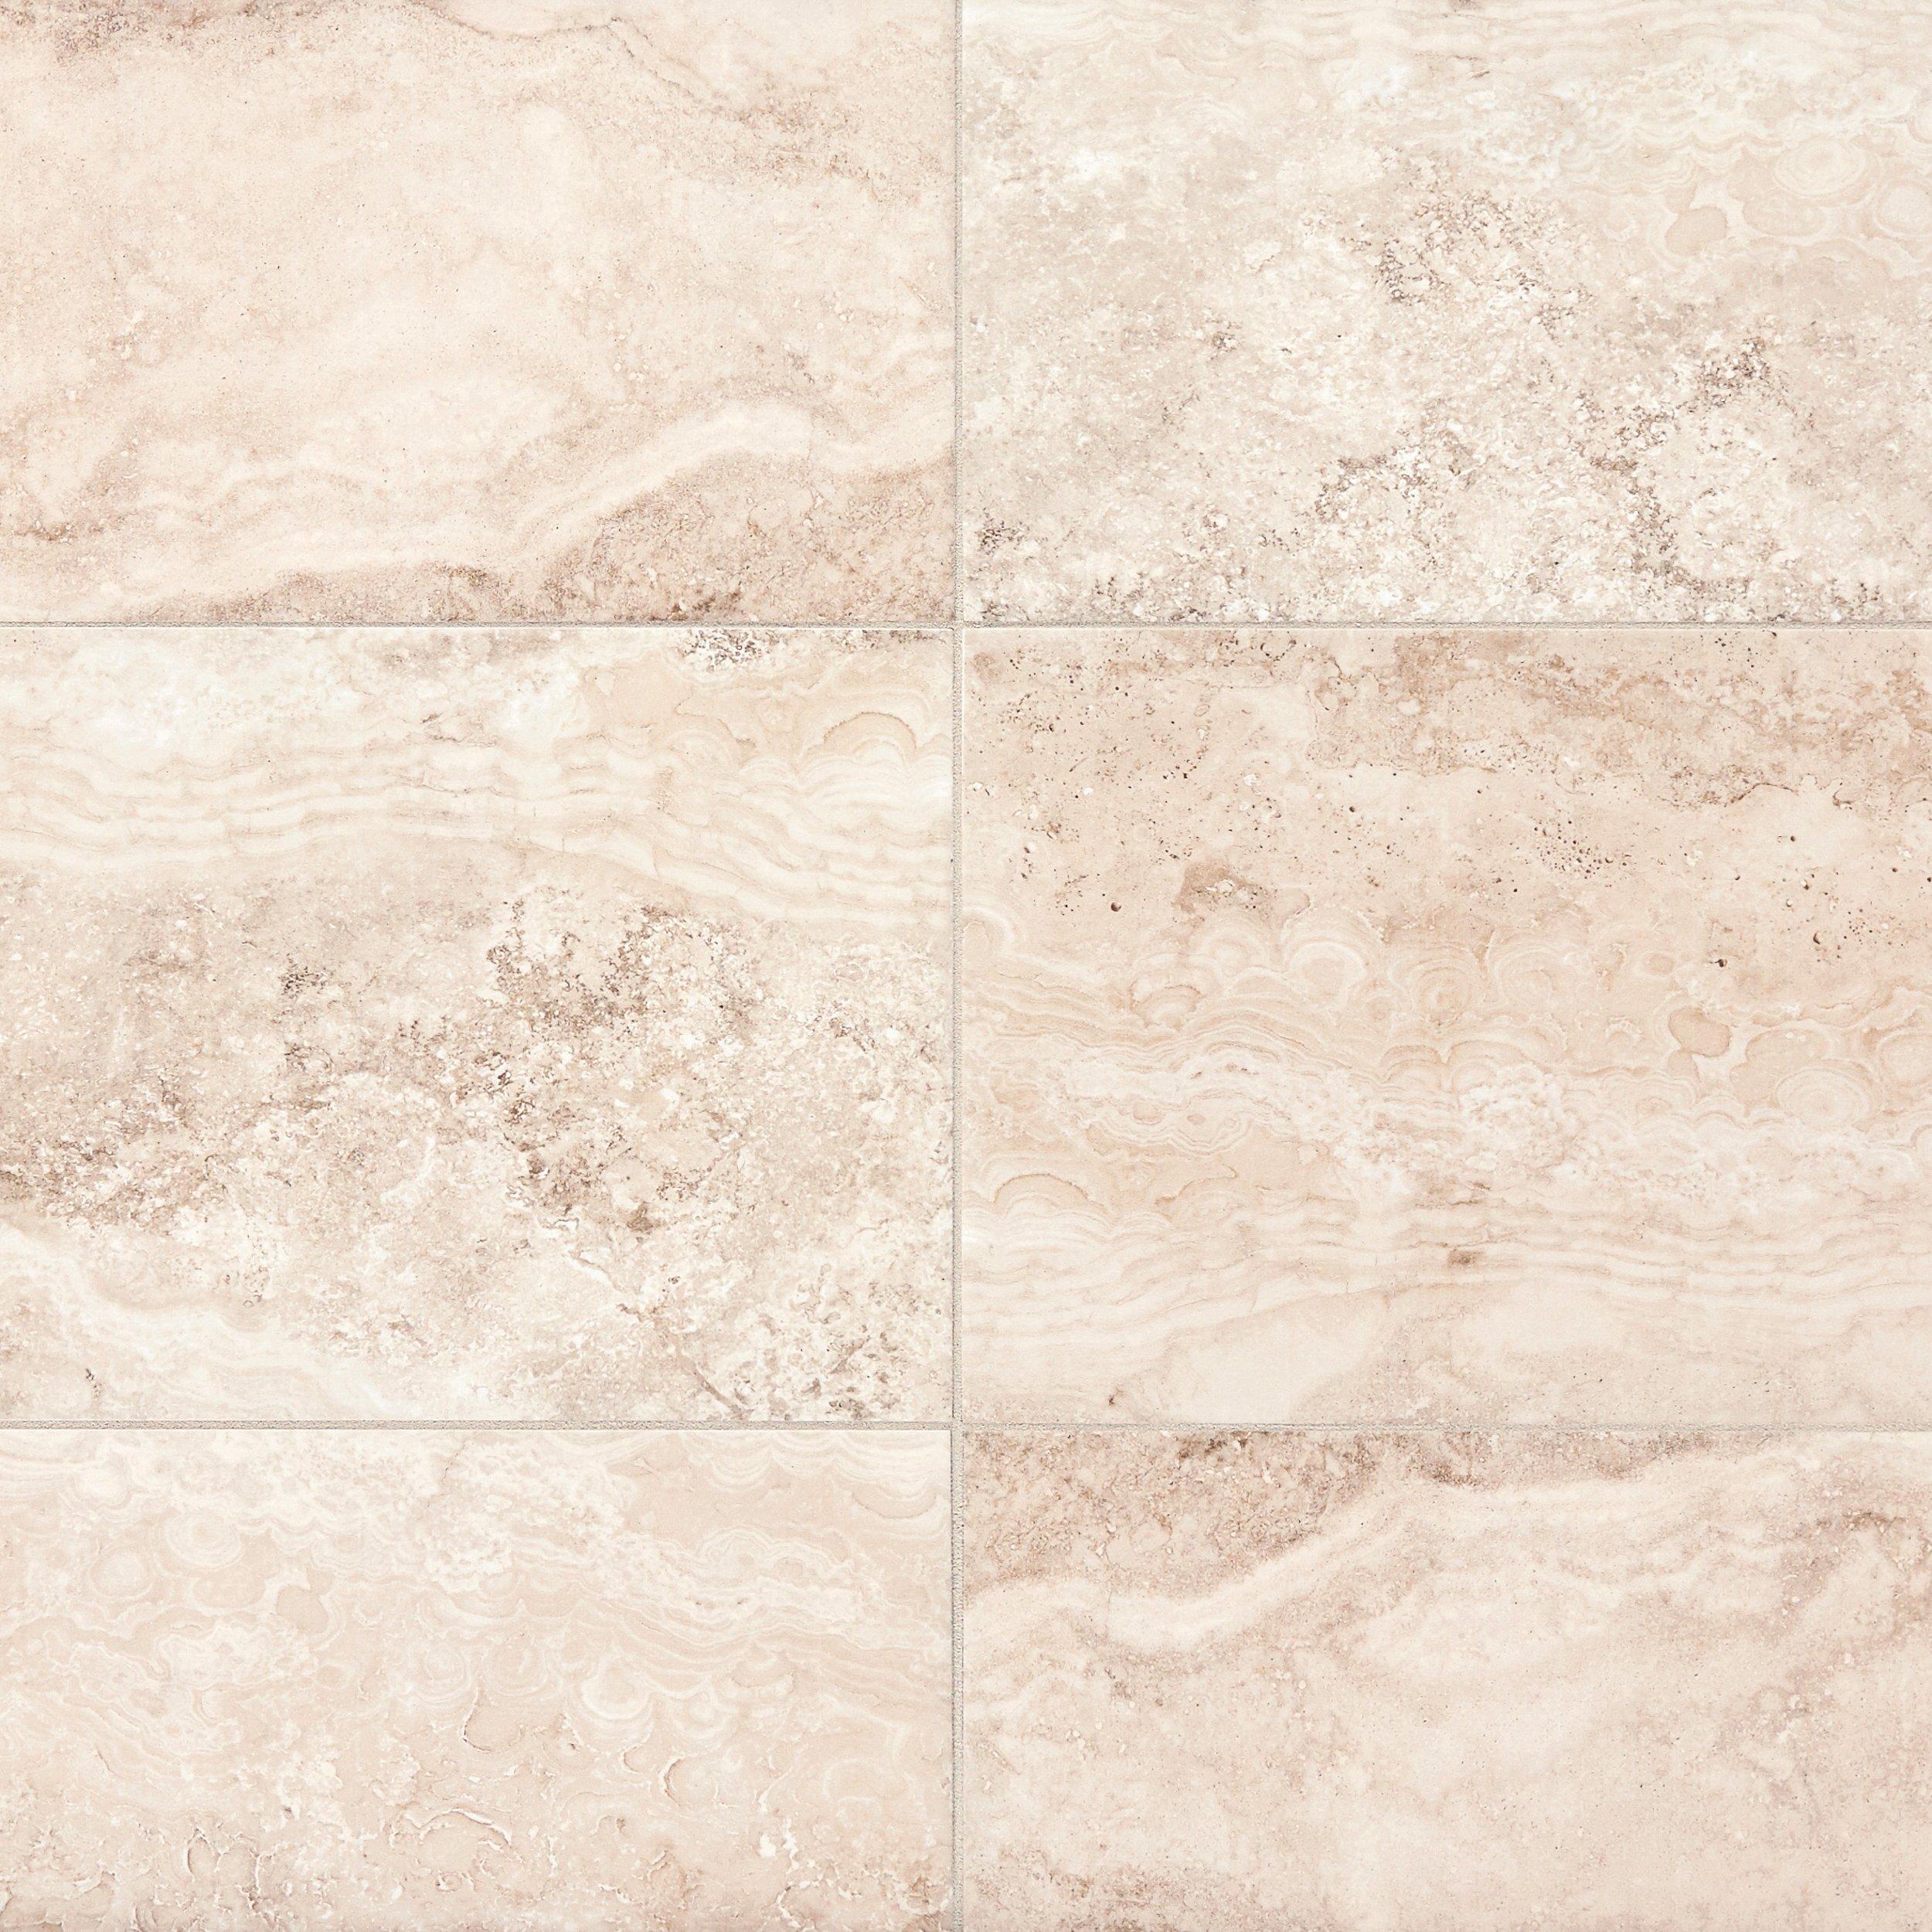 Odessa Beige Ceramic Tile Floor Decor In 2020 Beige Ceramic Ceramic Tiles Tile Floor